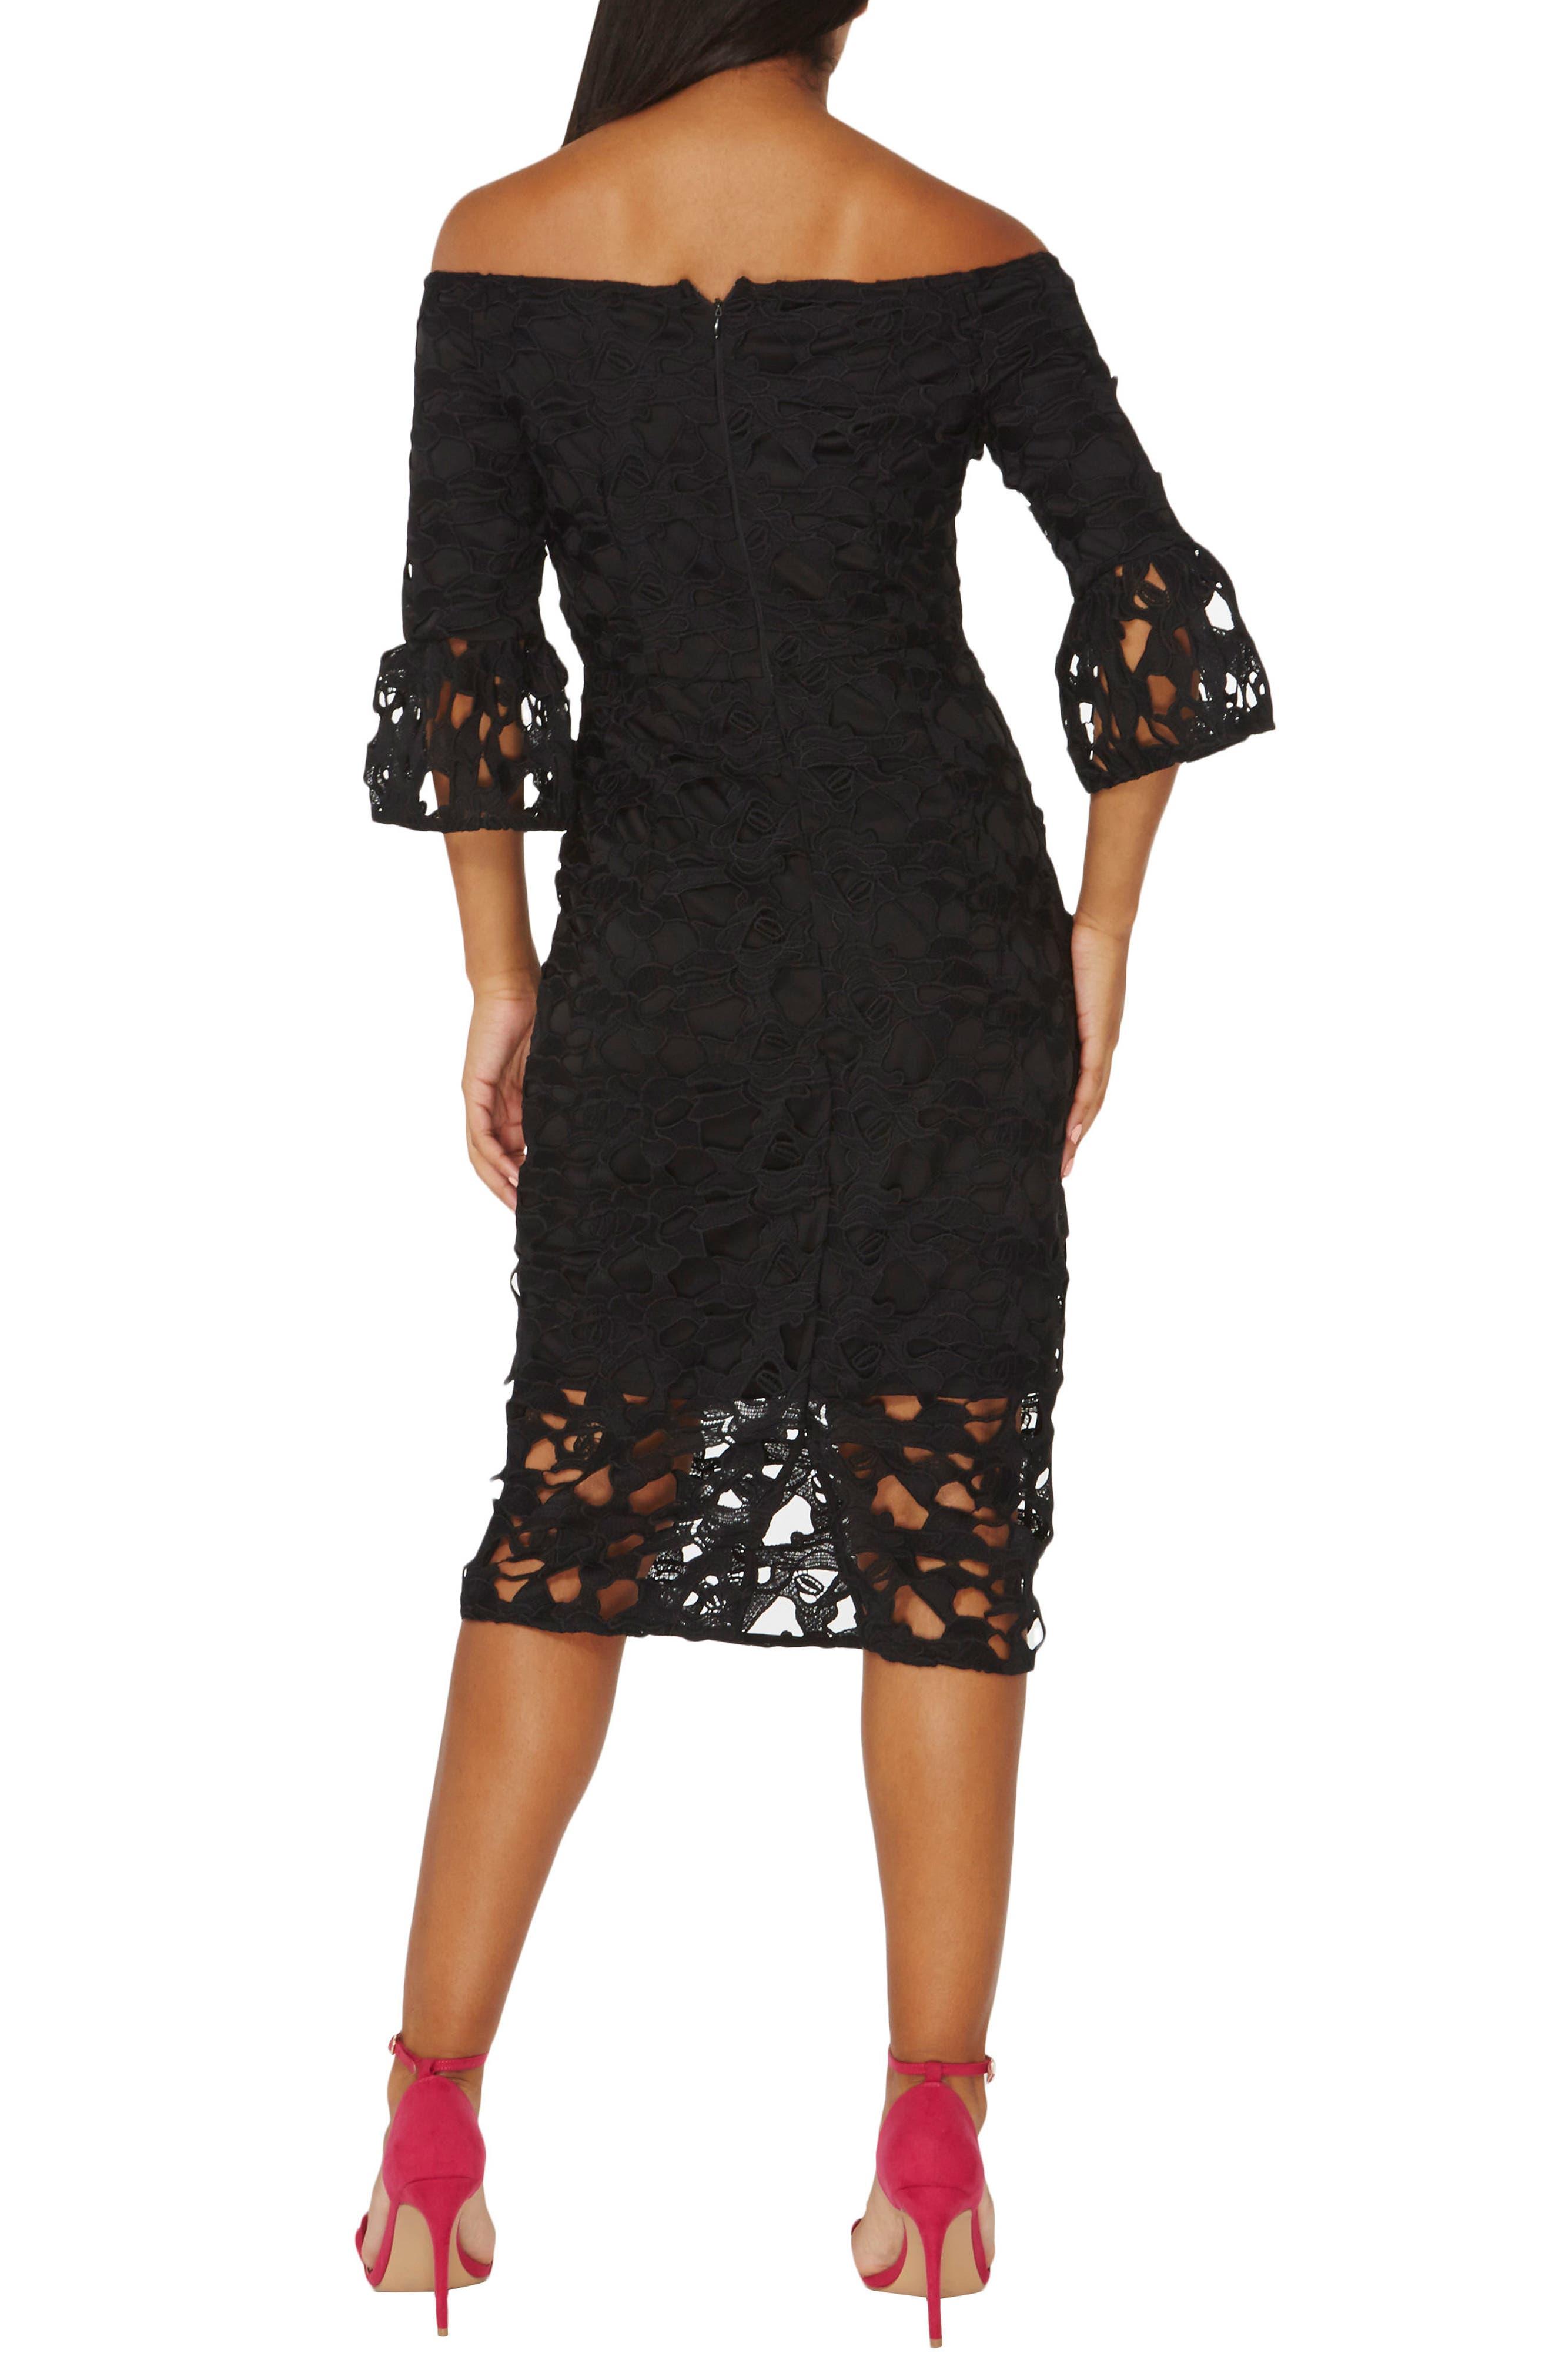 Lace Off the Shoulder Dress,                             Alternate thumbnail 2, color,                             010